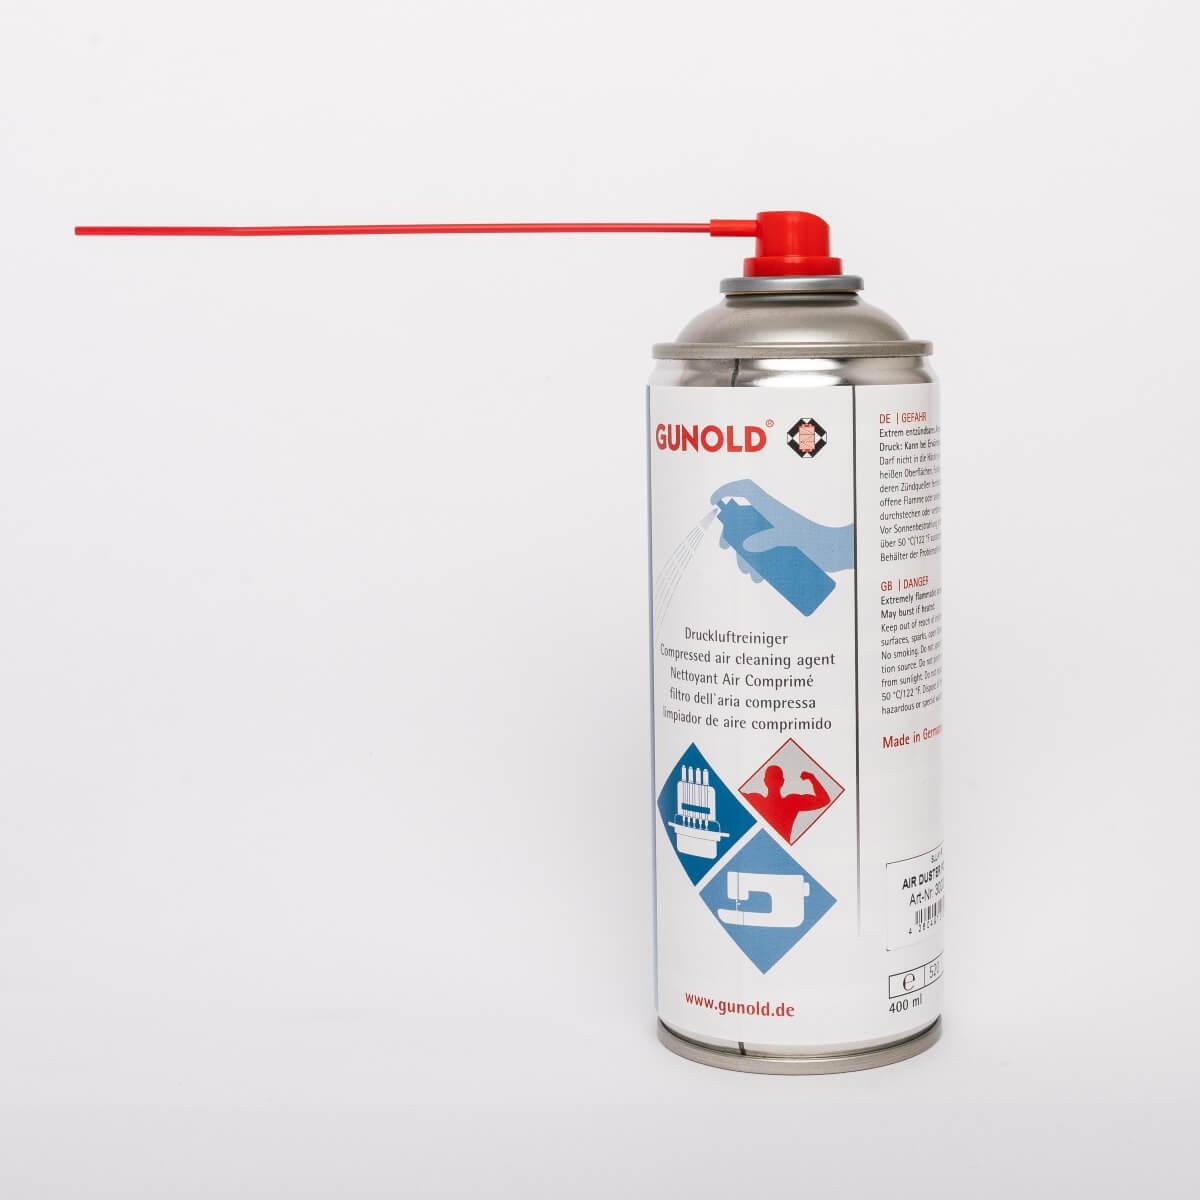 GUNOLD AIR DUSTER POWER, Druckluftspray, Dose 400 ml